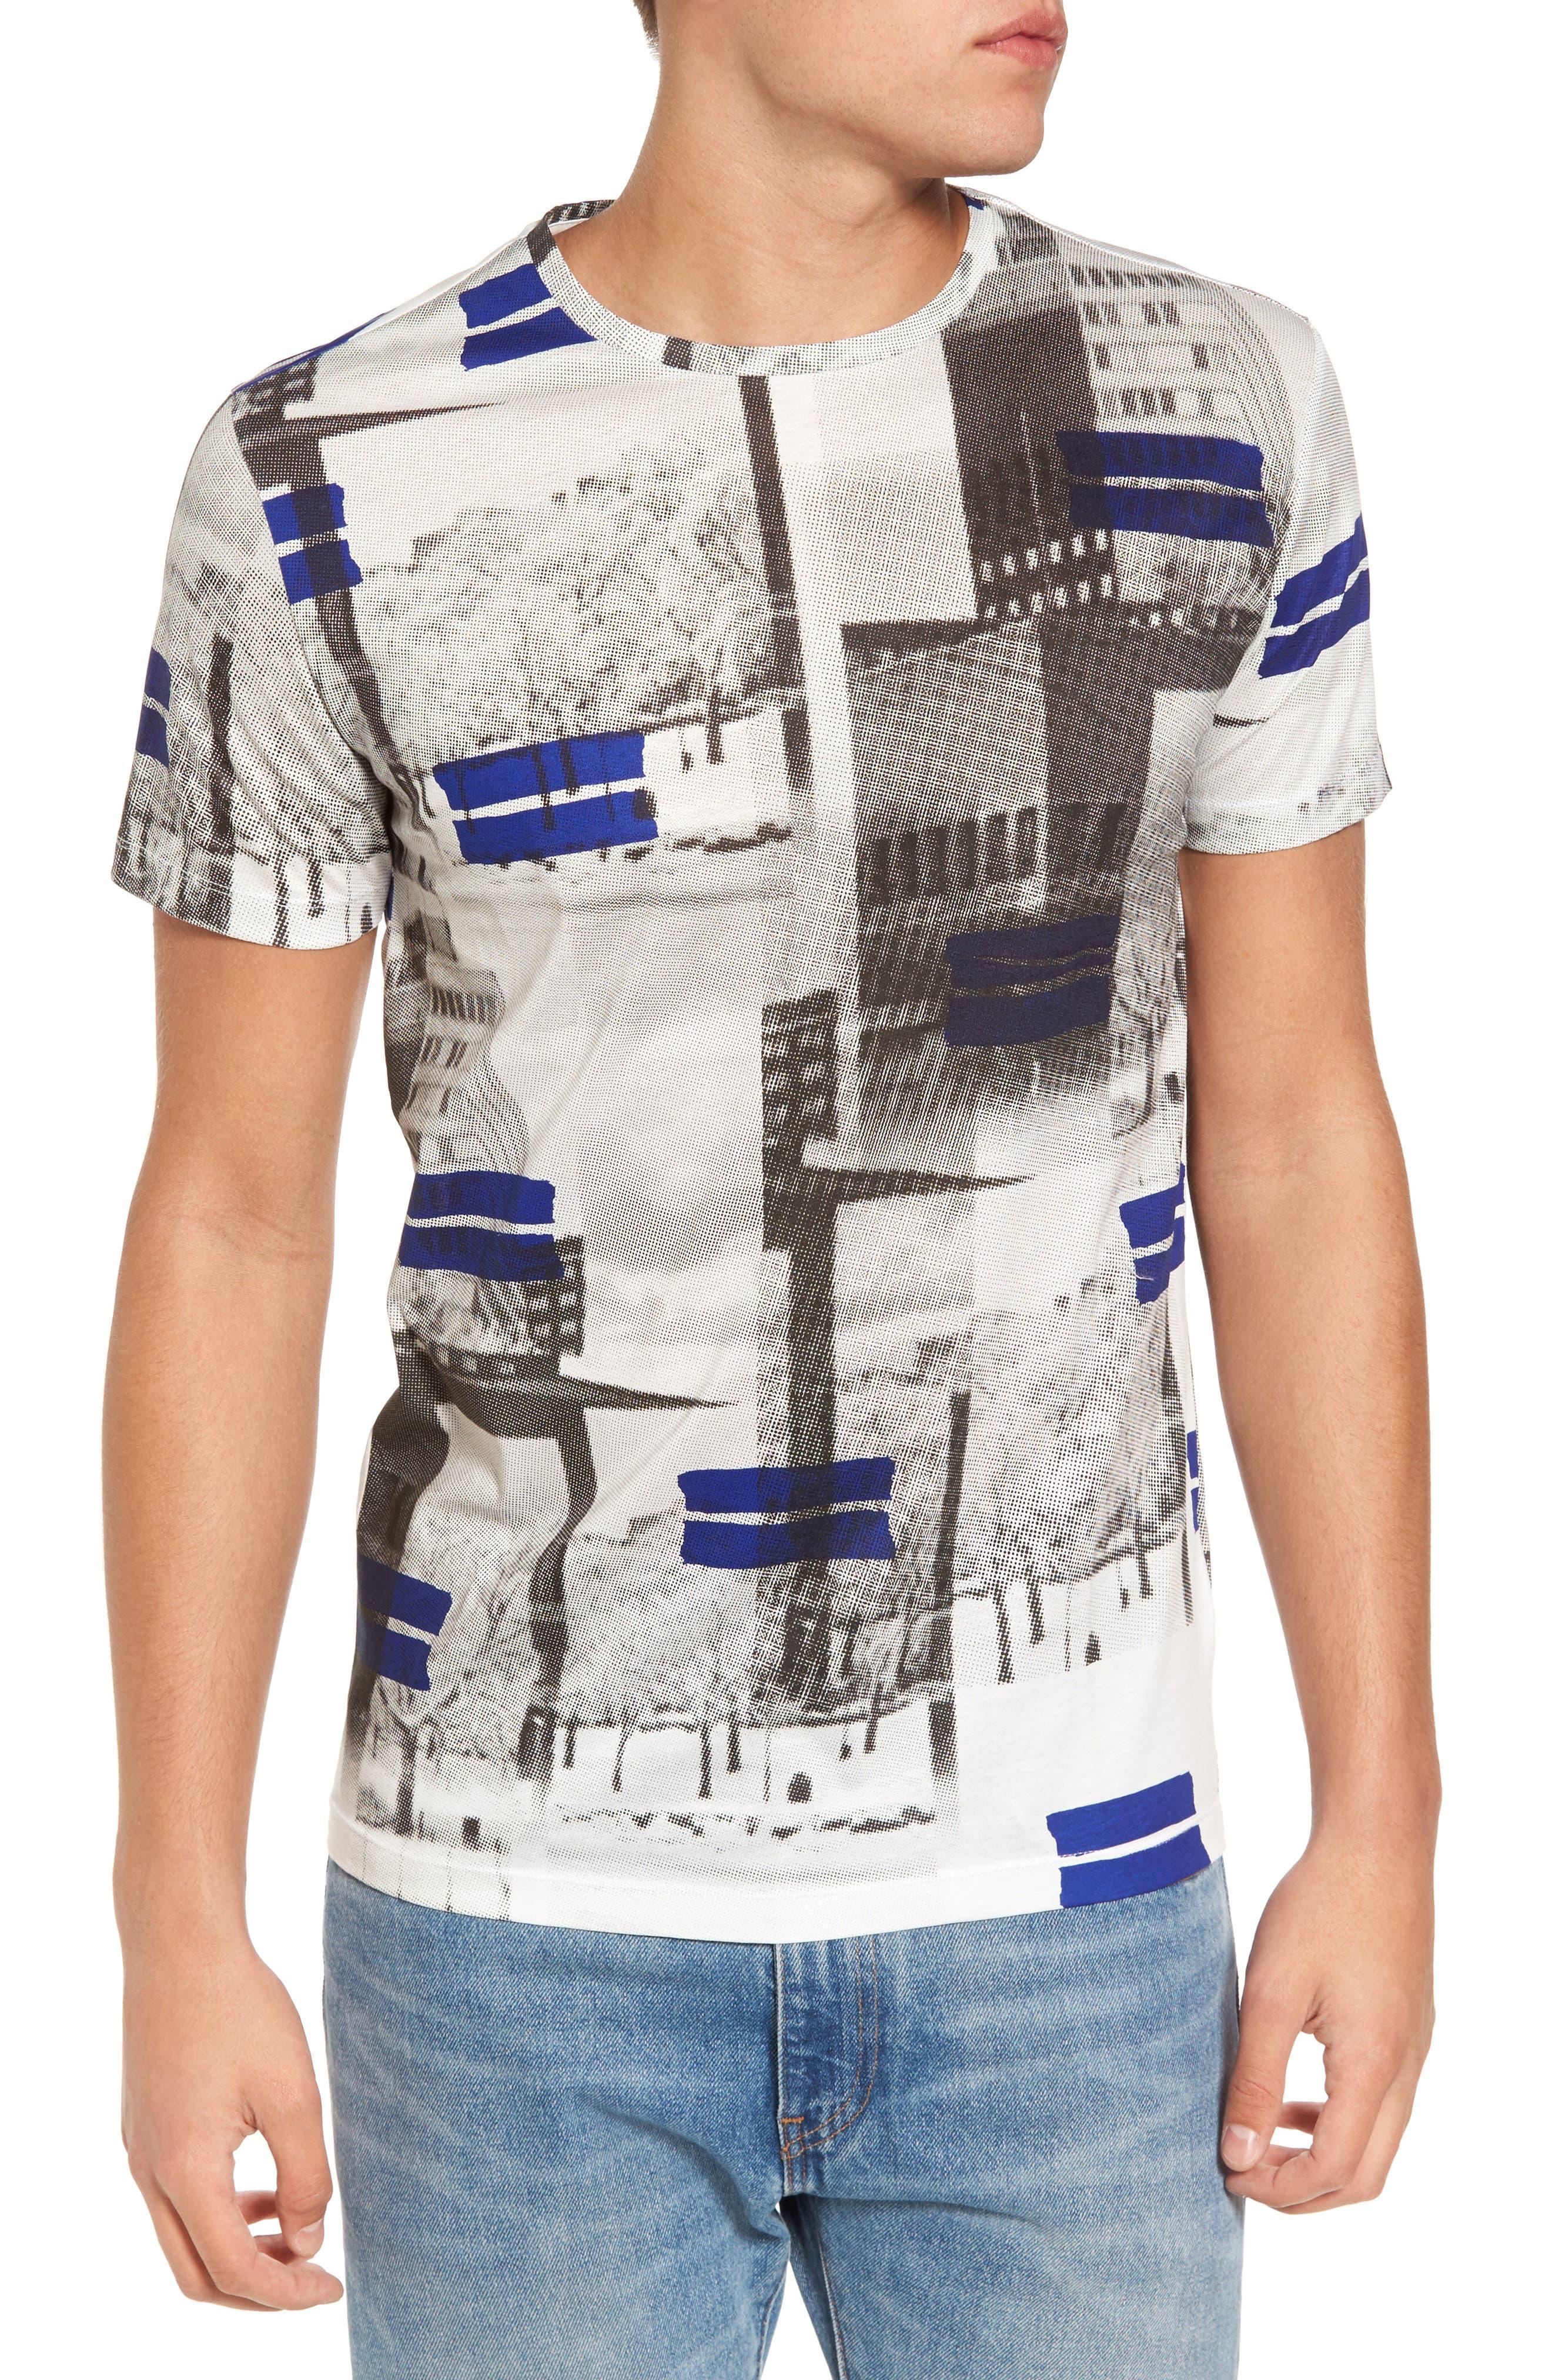 Main Image - Antony Morato Graphic T-Shirt